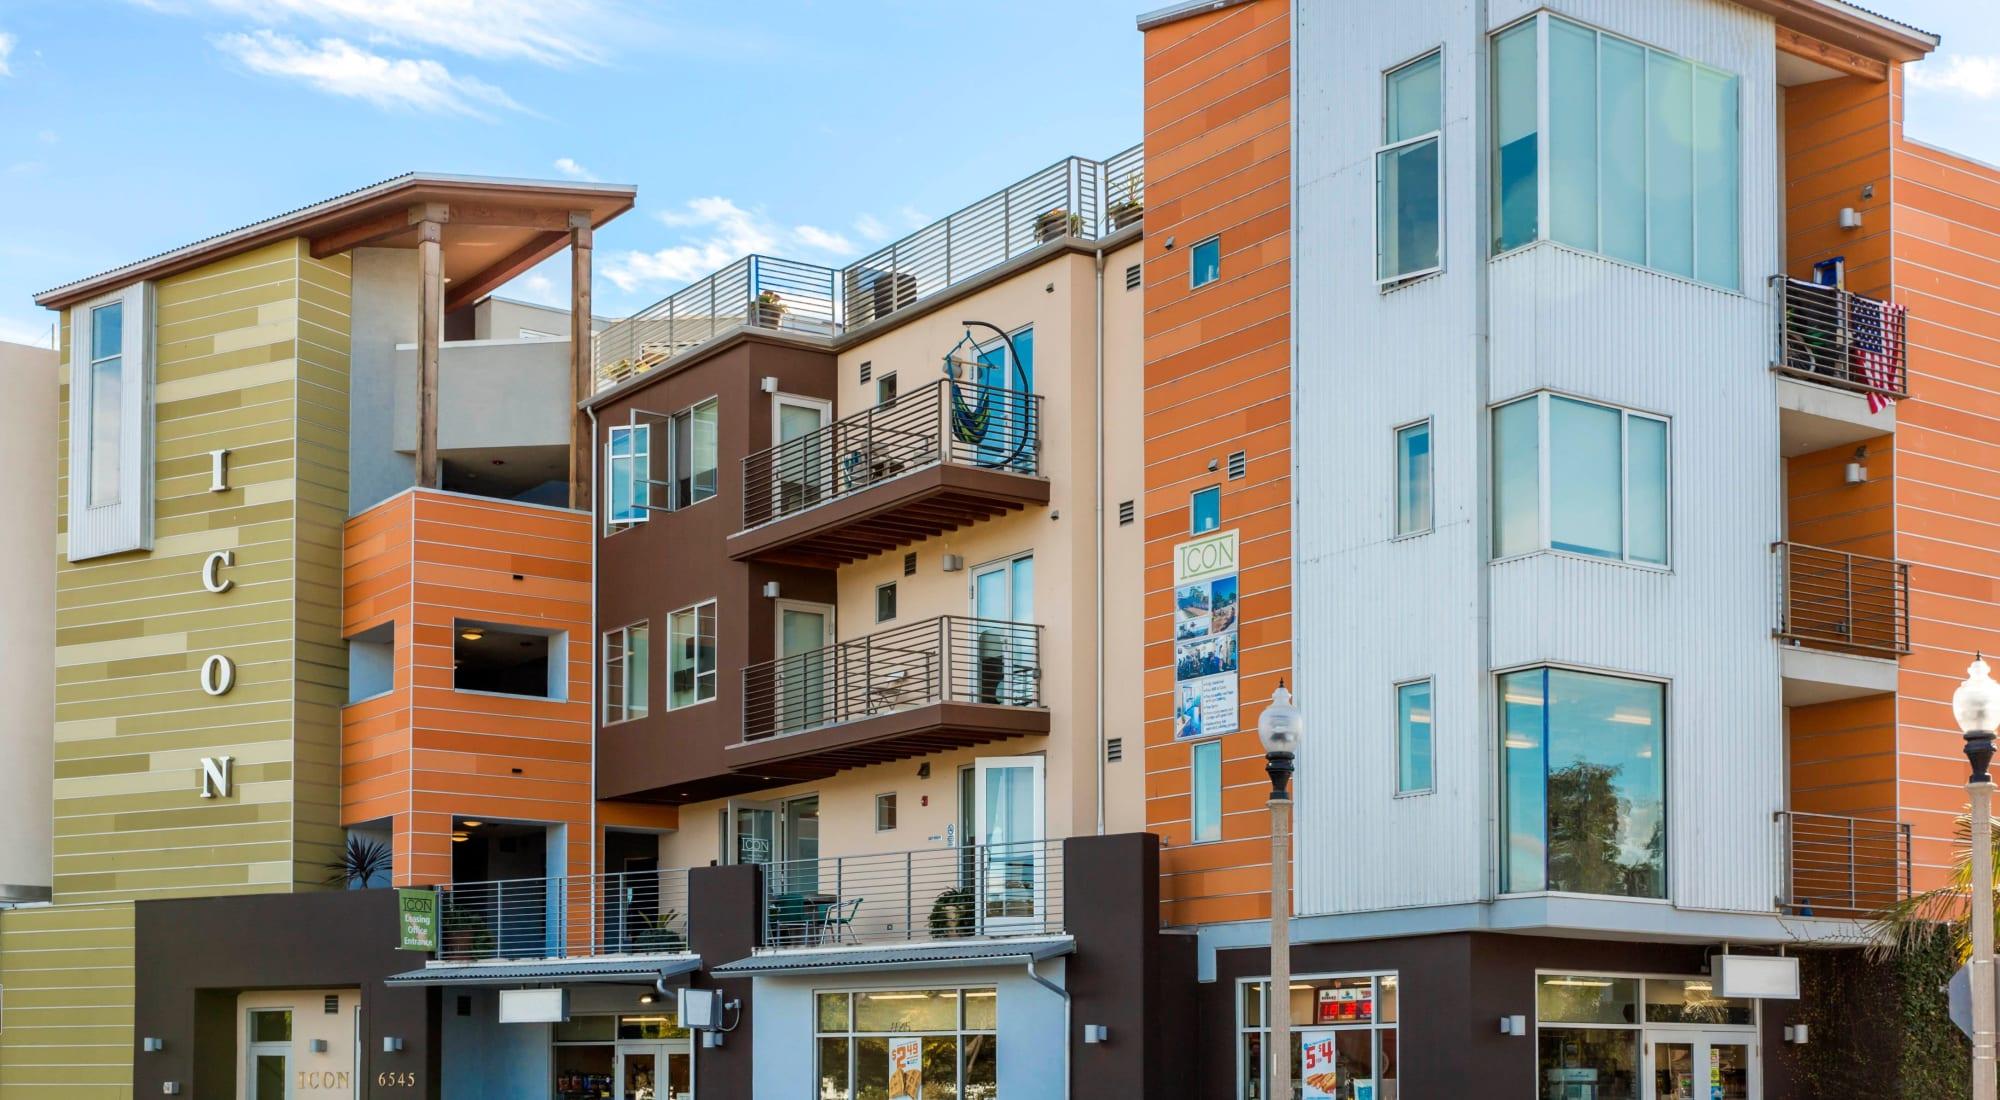 Apartments at ICON in Isla Vista, California